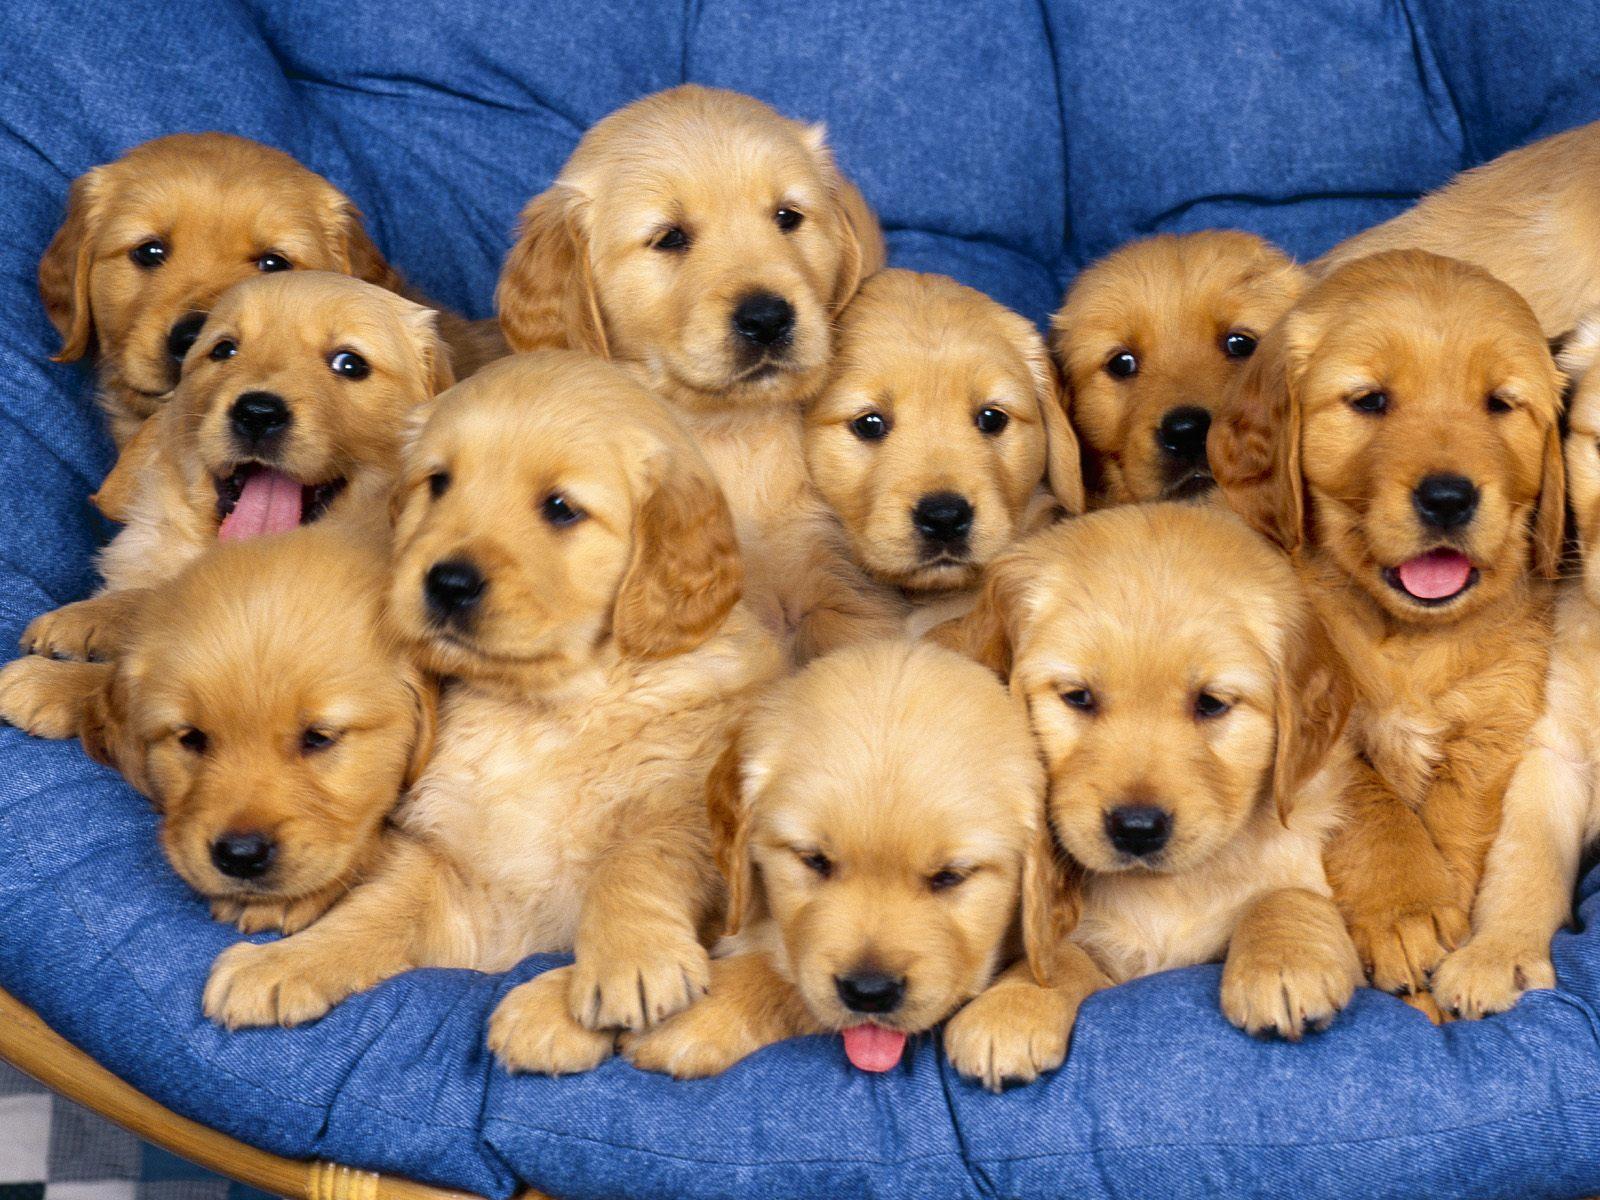 wallpaper beautiful dog image cute puppies wallpapers dog hd wallpaper 1600x1200